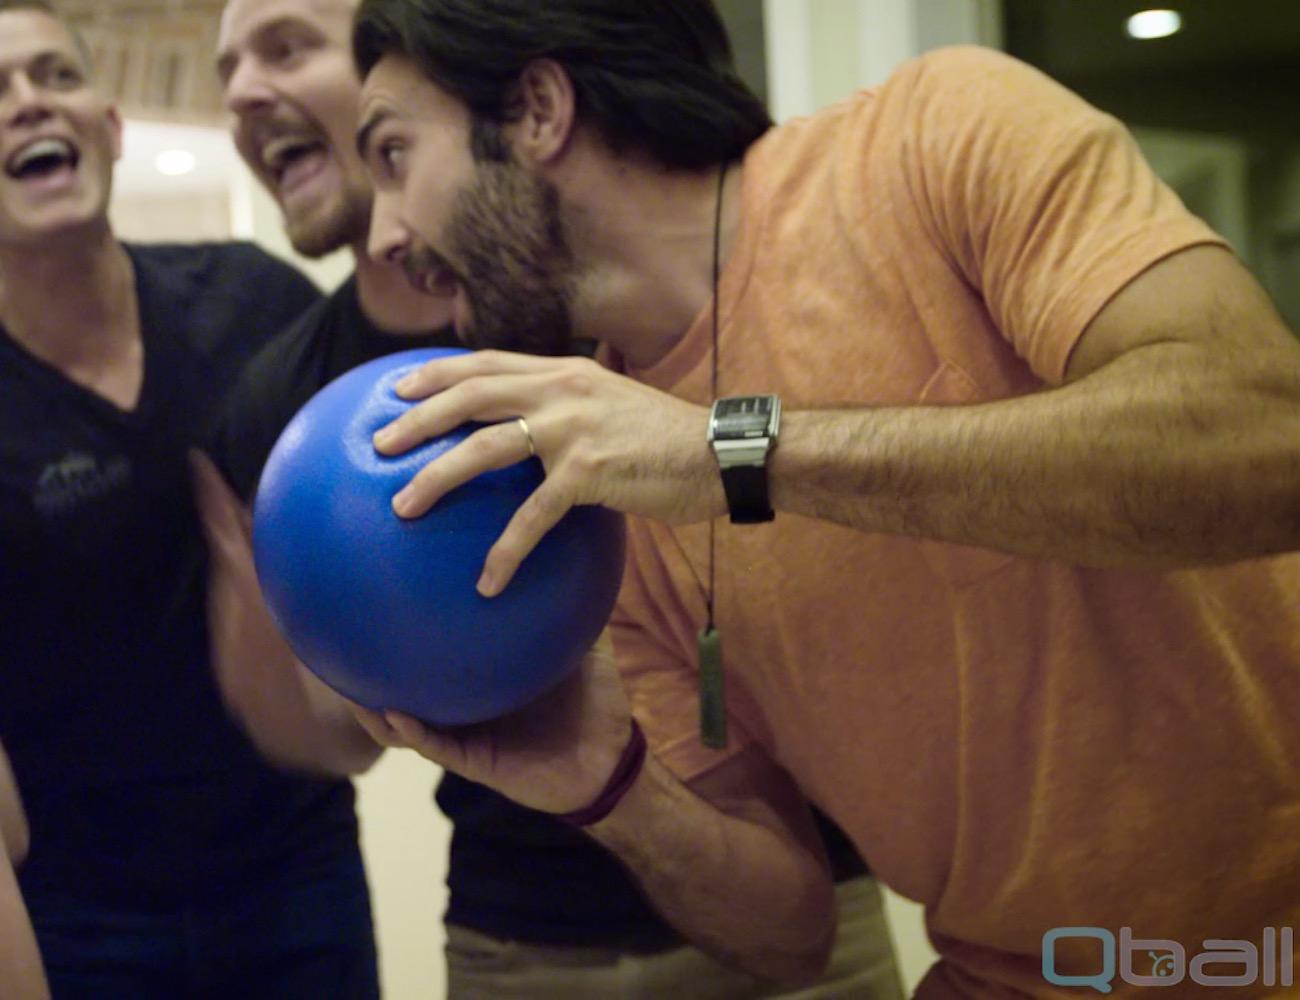 Qball – Throwable Wireless Microphone